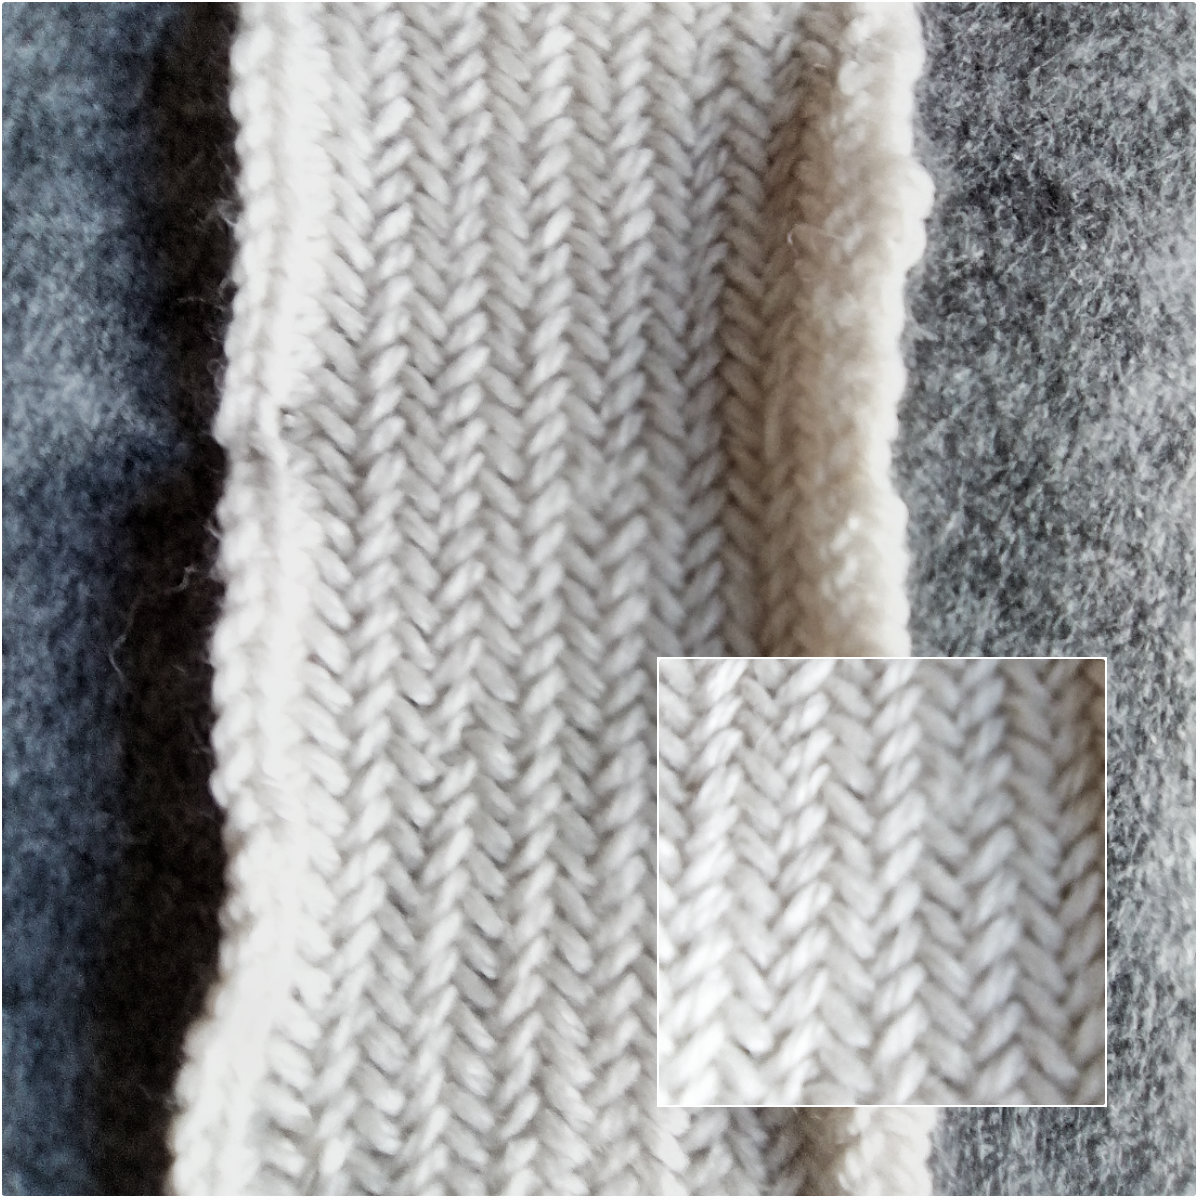 gk kreativ: Herringbone pattern / Fischgrätmuster stricken